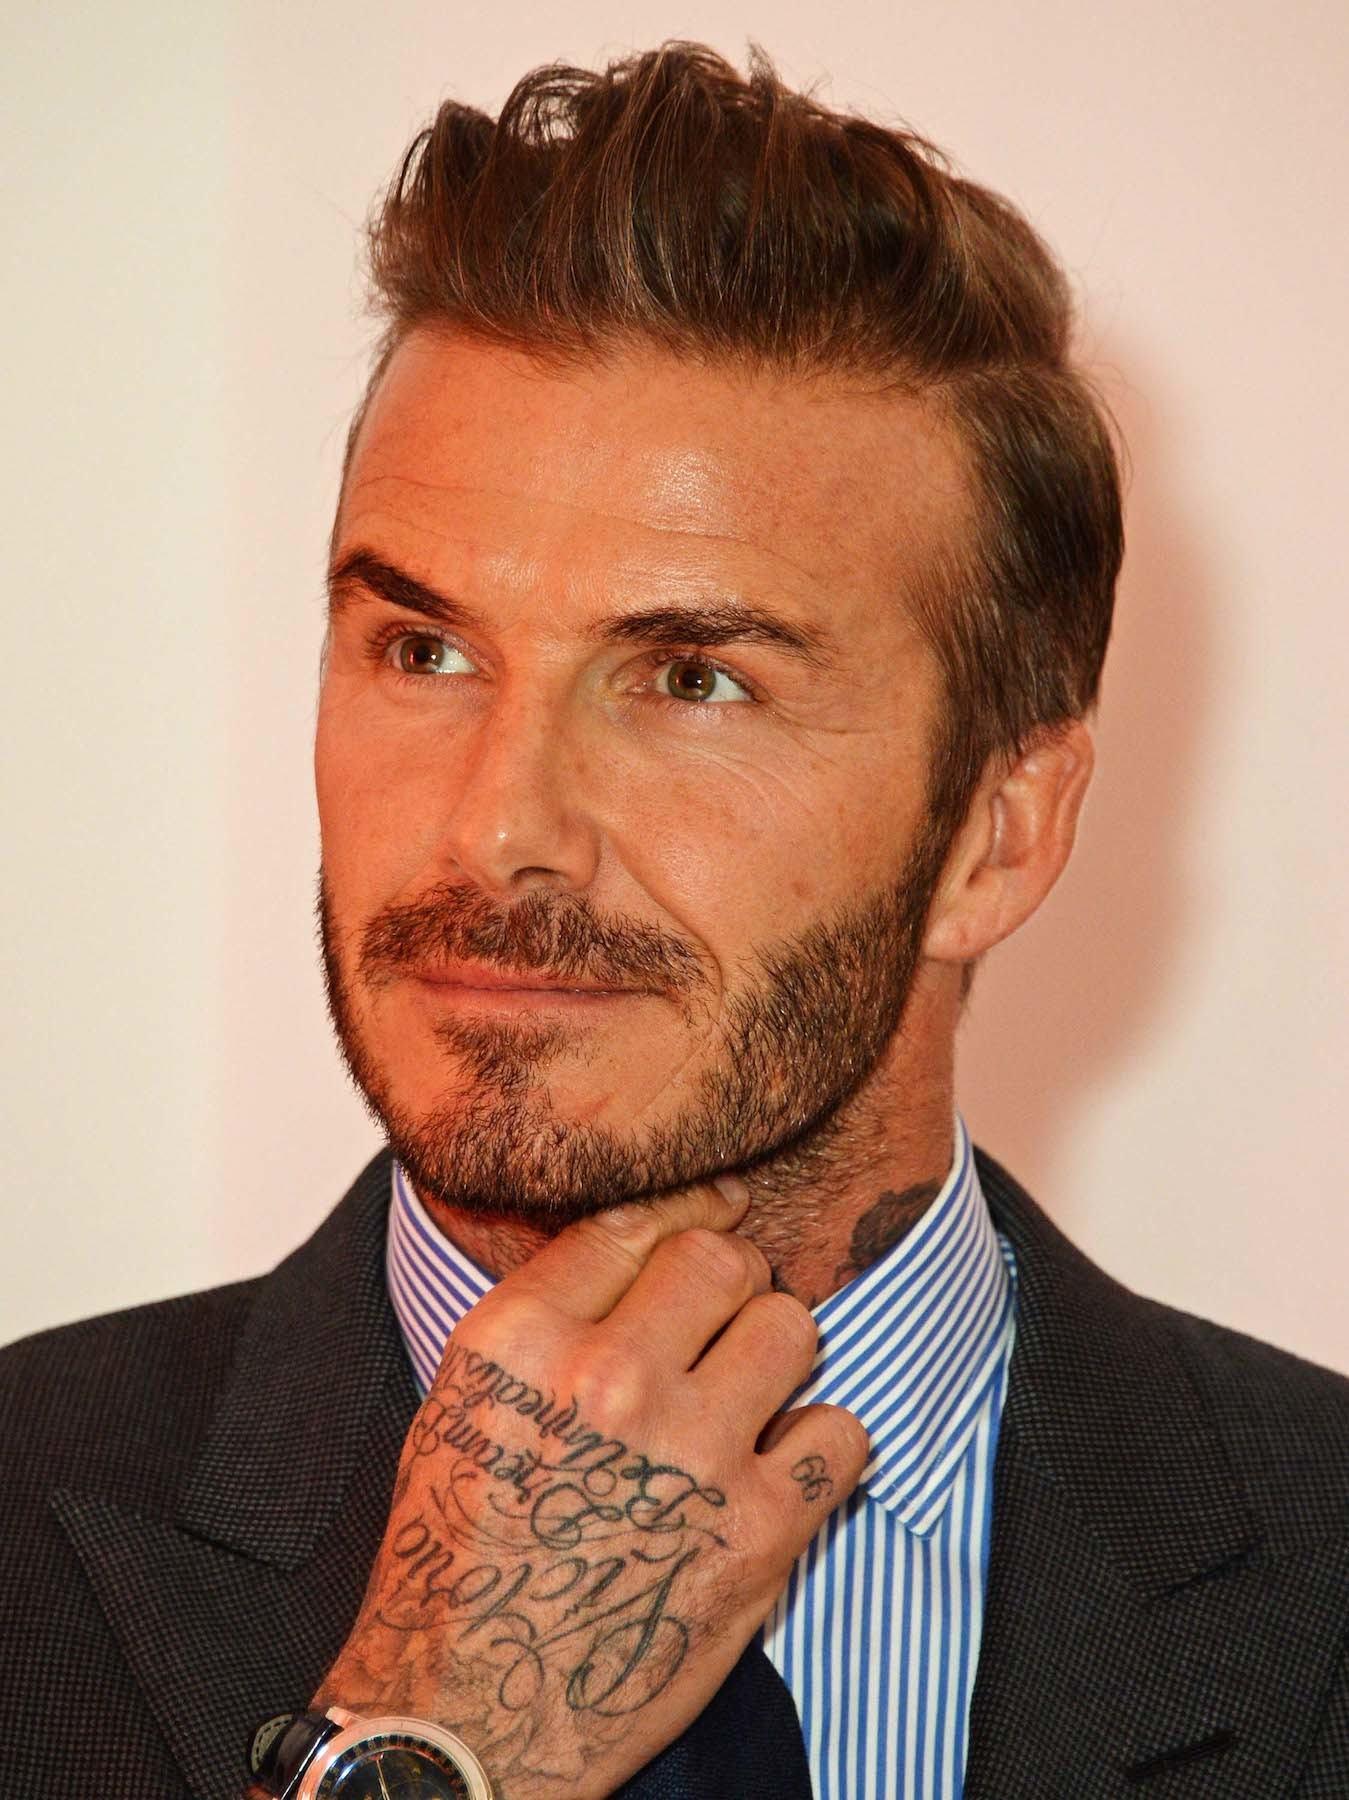 David Beckham gaya rambut pemain sepak bola